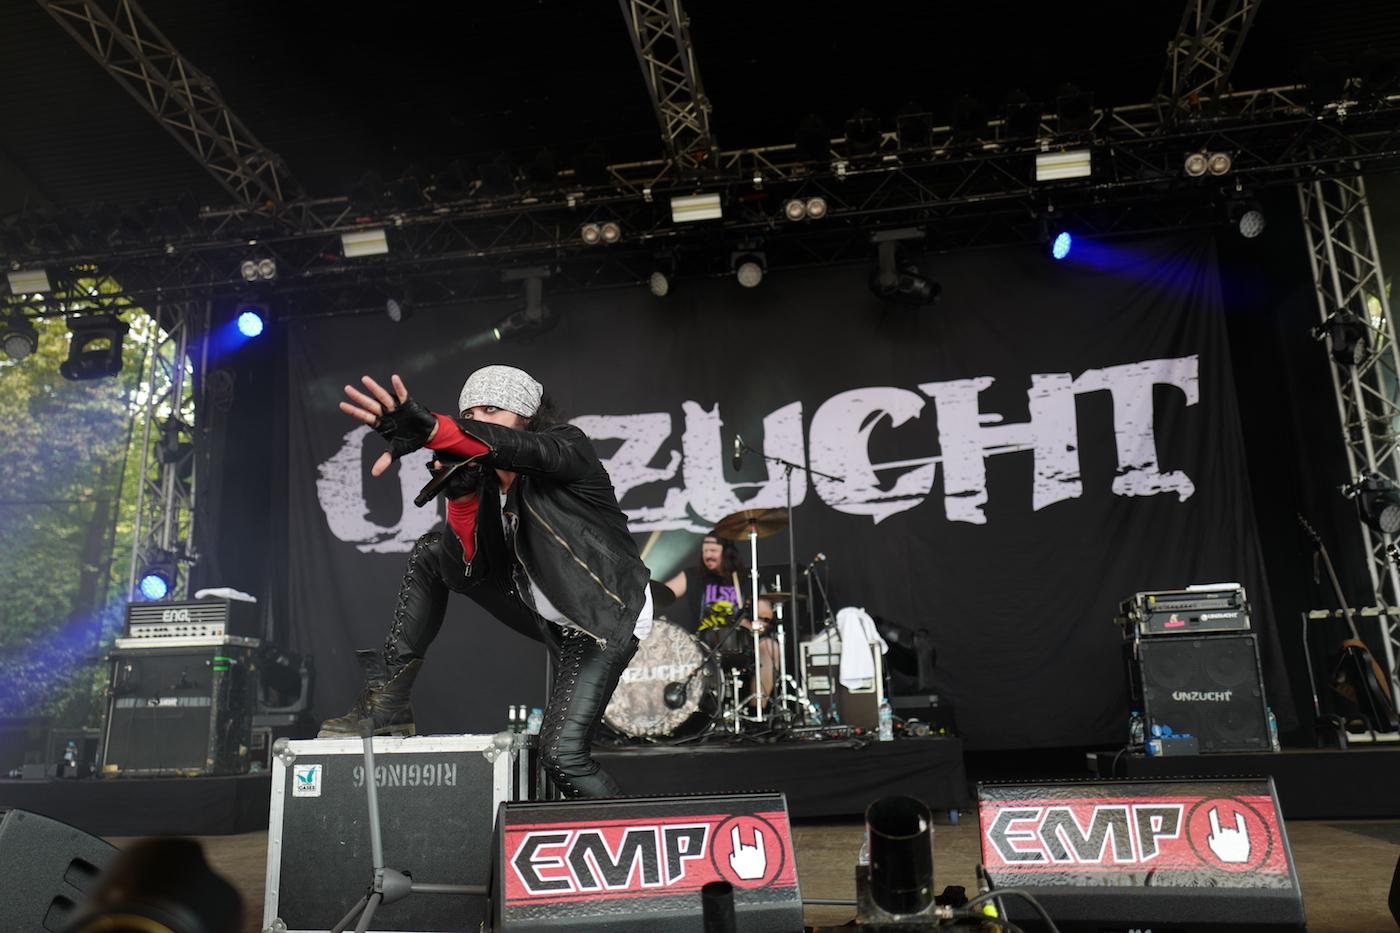 mark_benecke_amphi_festival_koeln_cologne_tanzbrunnen_gothic_OMD_oomph_agonoize_mono_inc_es23_sitd_solar_fake - 43.jpg